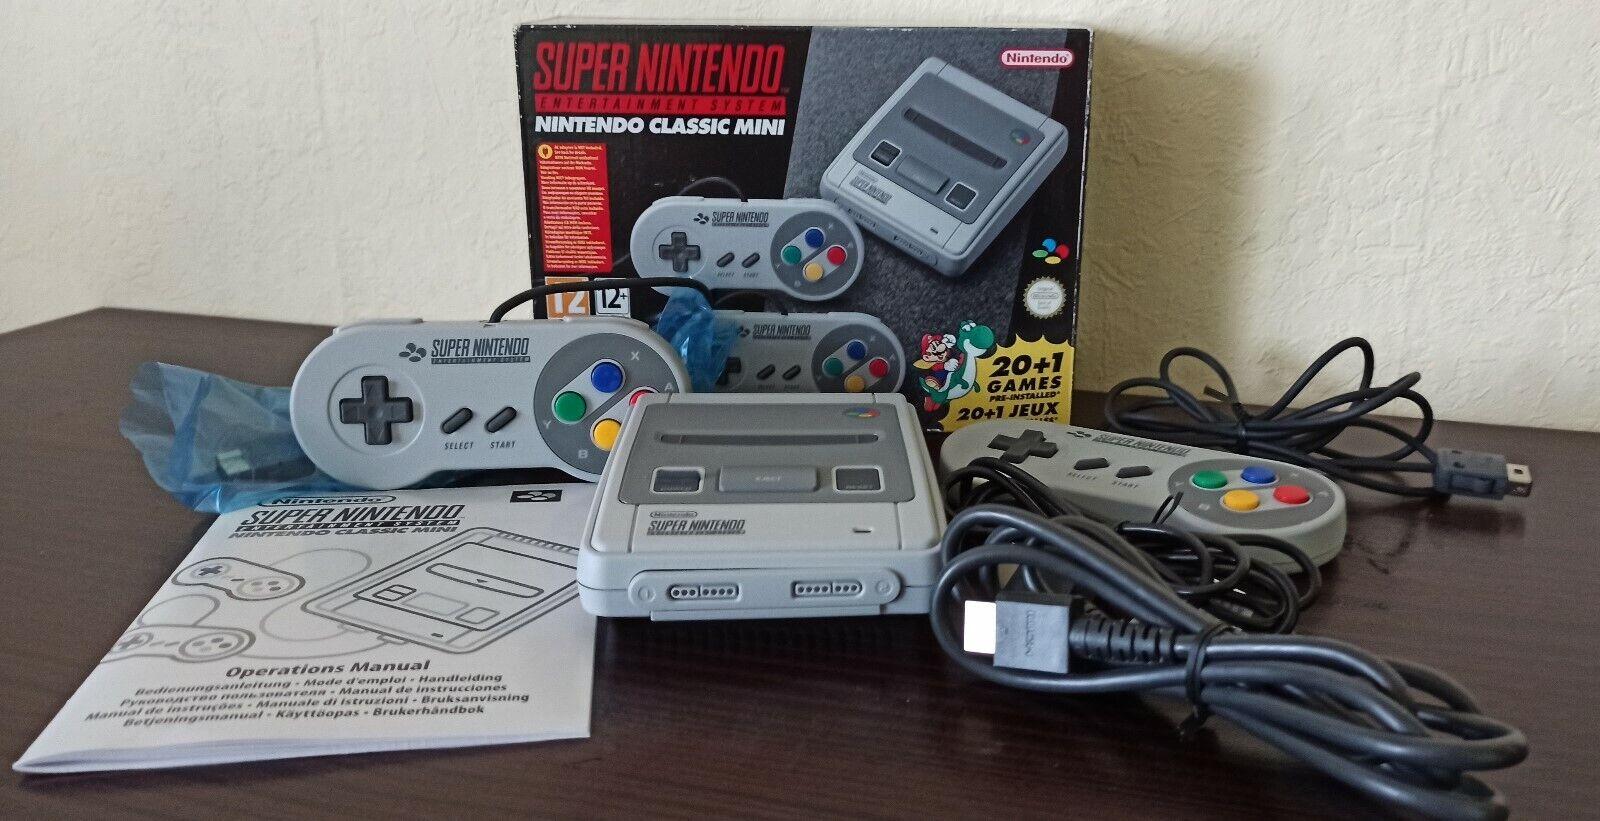 Super Nintendo Classic OVP 200 Spiele ! SNES Mini Retro 90er Zeitvertrag Top